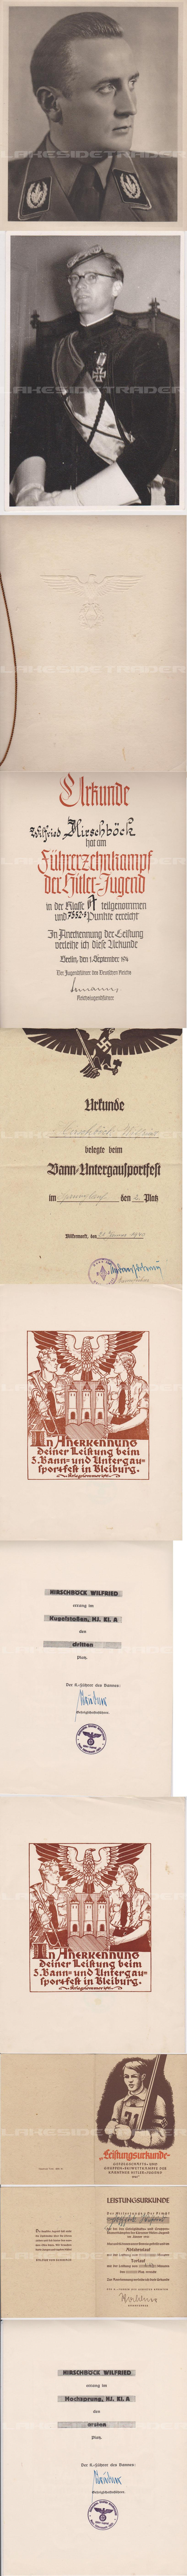 HJ Document Grouping Wilfried Hirschbock